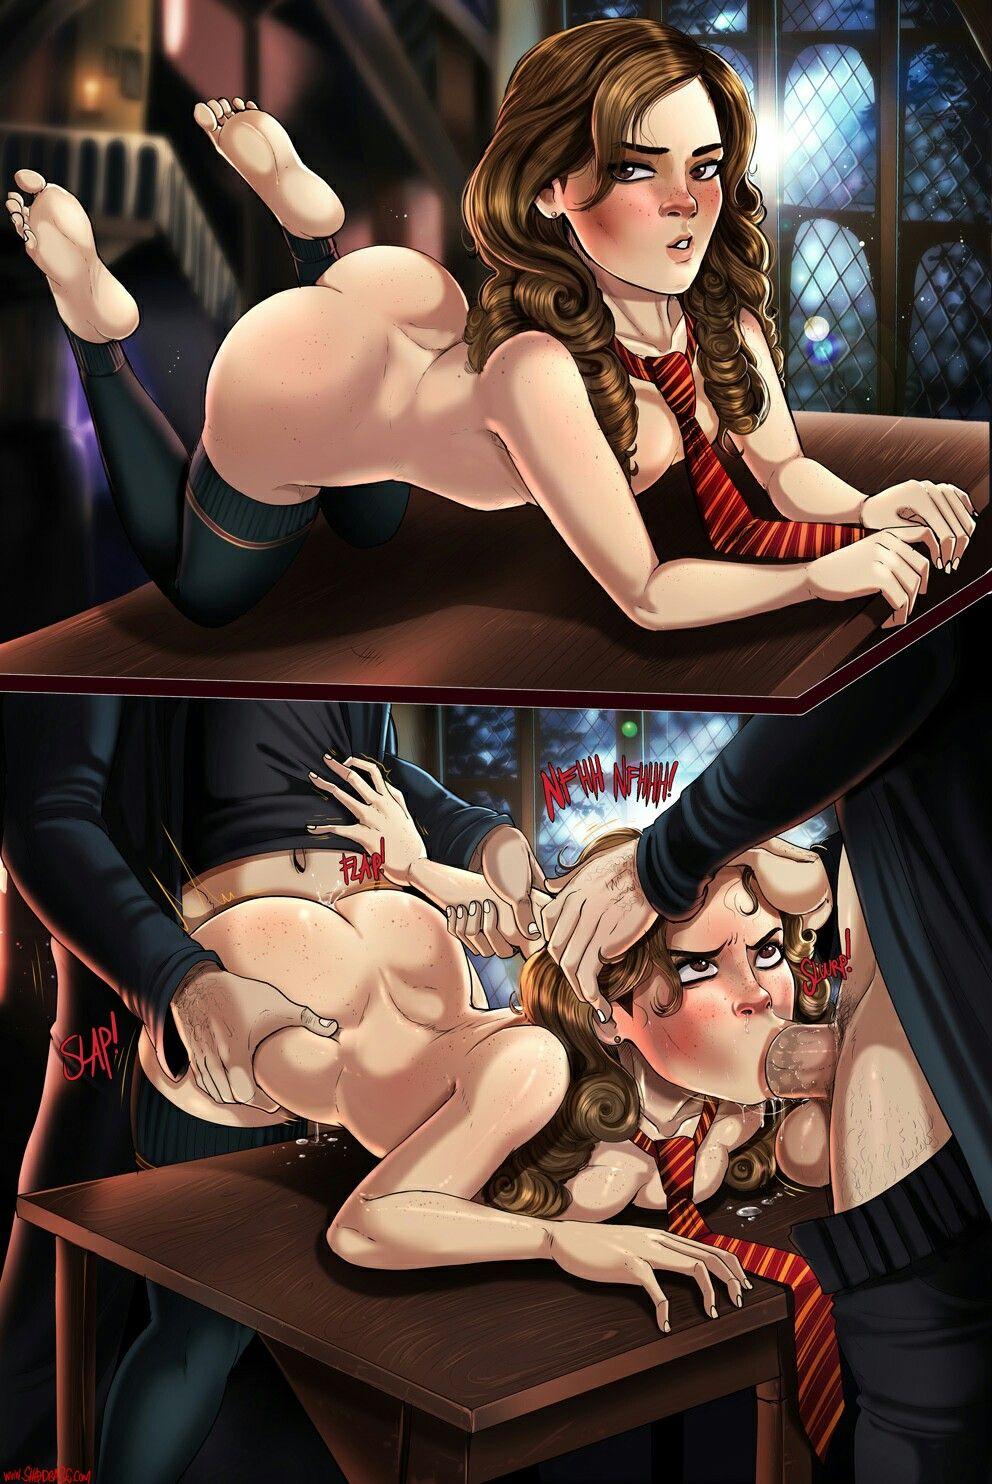 Гермиона как порно актриса